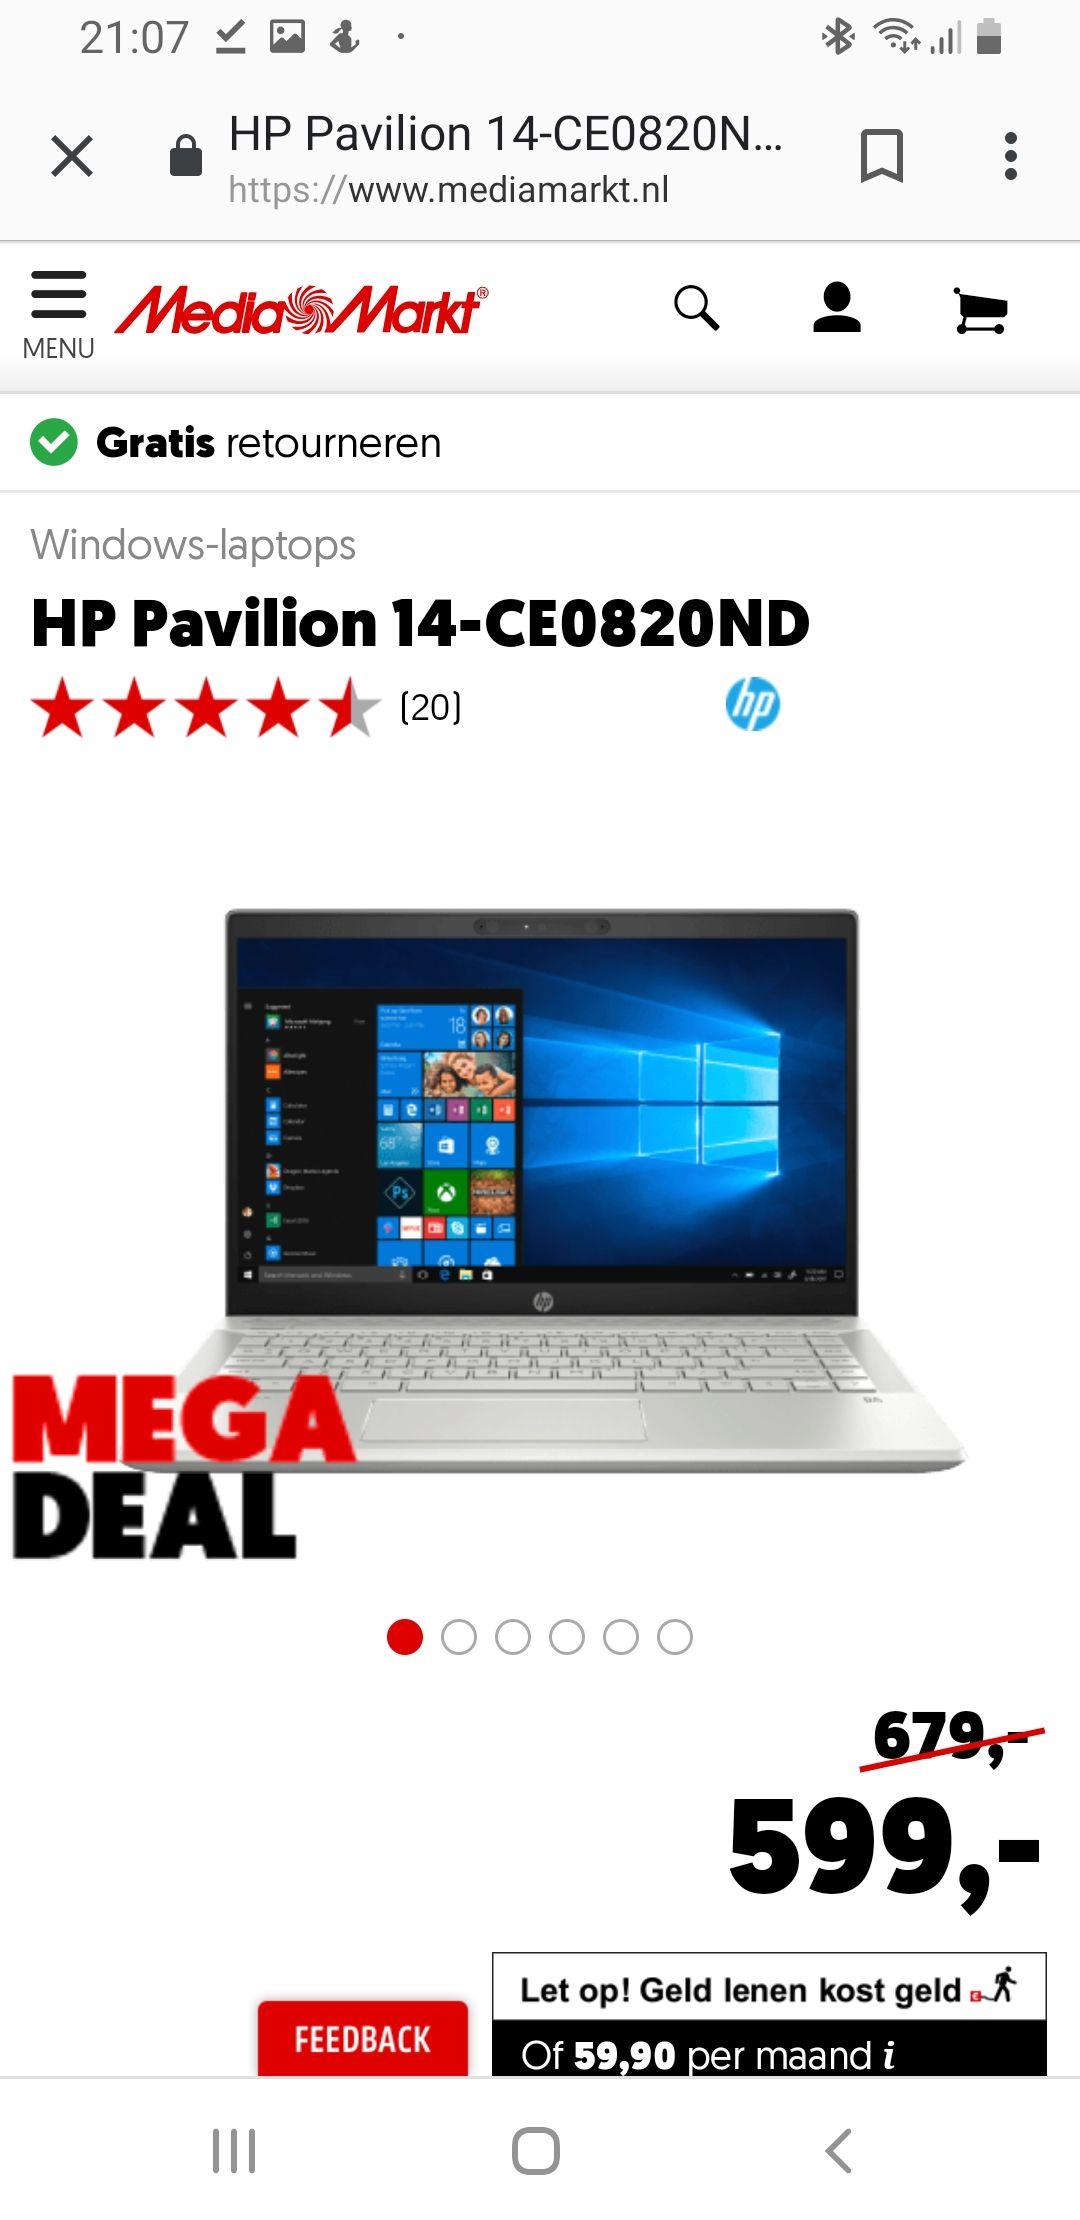 Hp pavilion 14 inch laptop normaal 679 nu 599